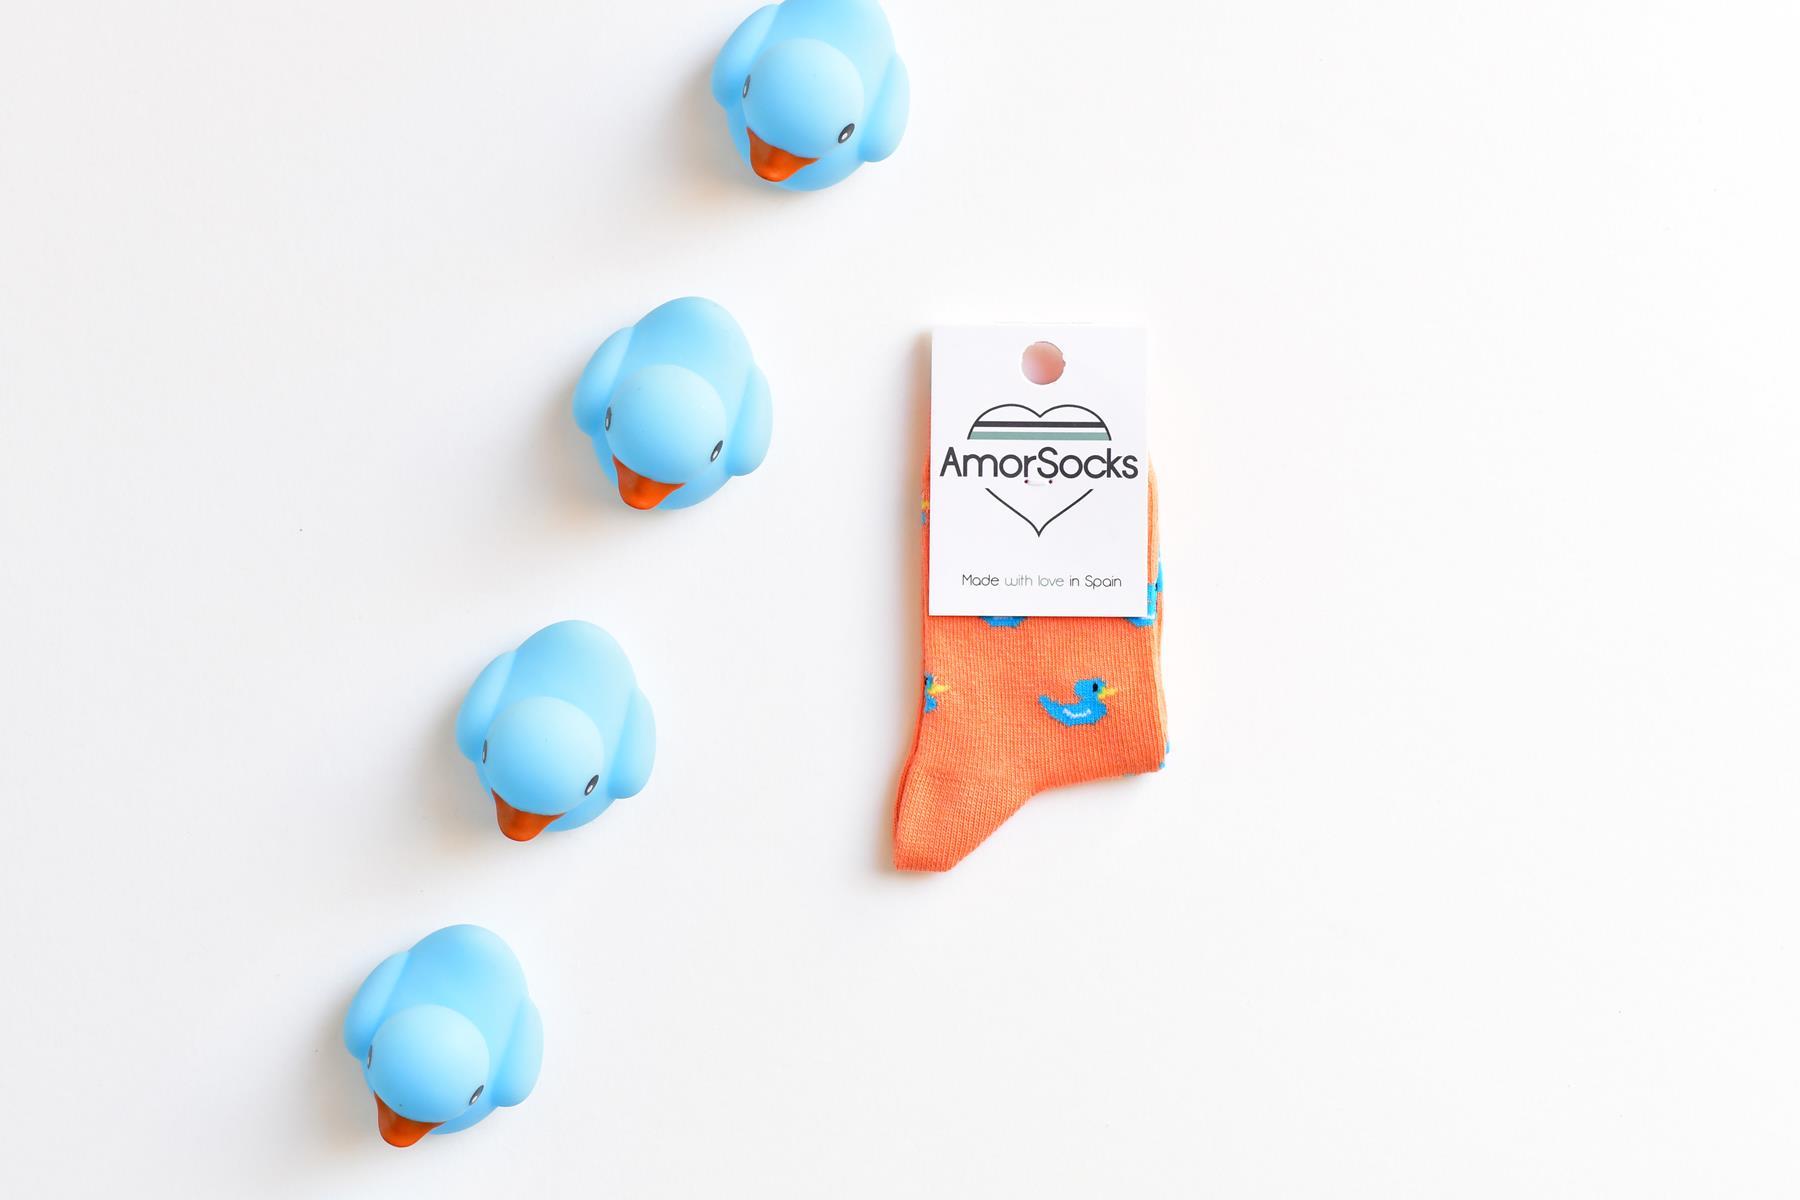 AmorSocks-calcetines-socks-niños-niñas-patos-kids-patitos-de-goma-ducks-rubber-ducks-coral-azul-blue